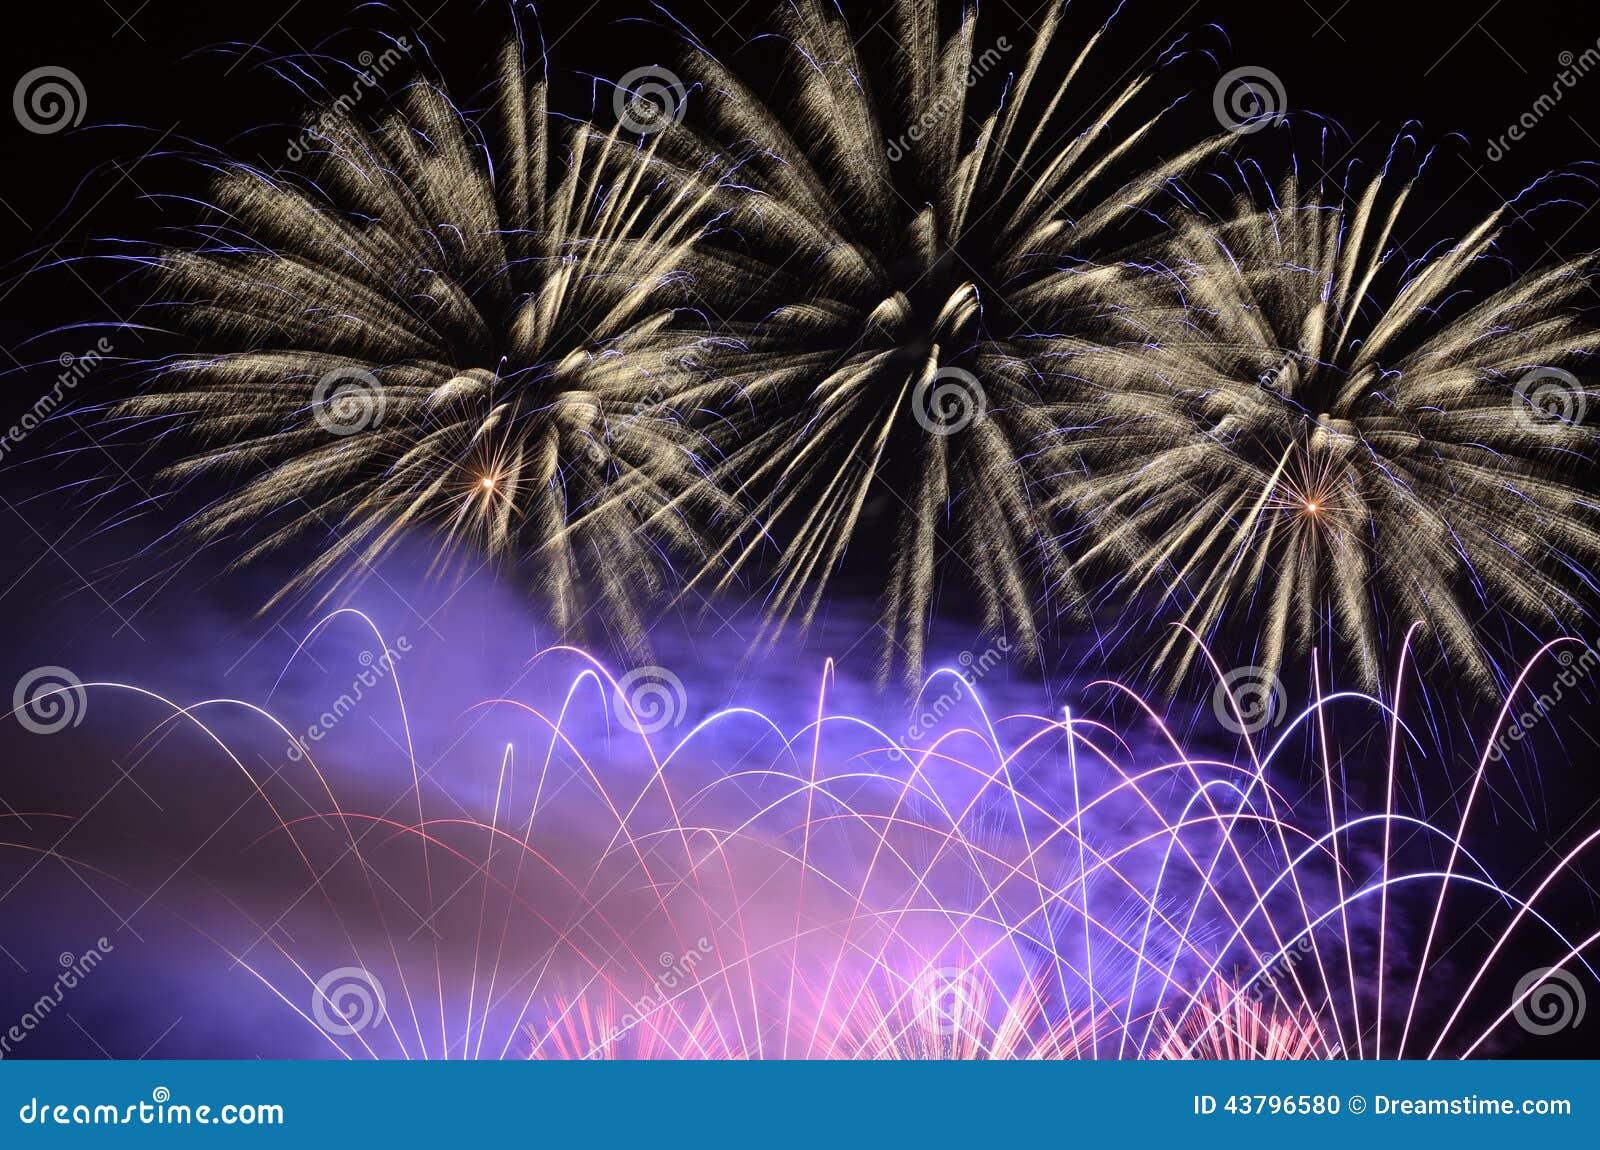 amazing flash of of fireworks